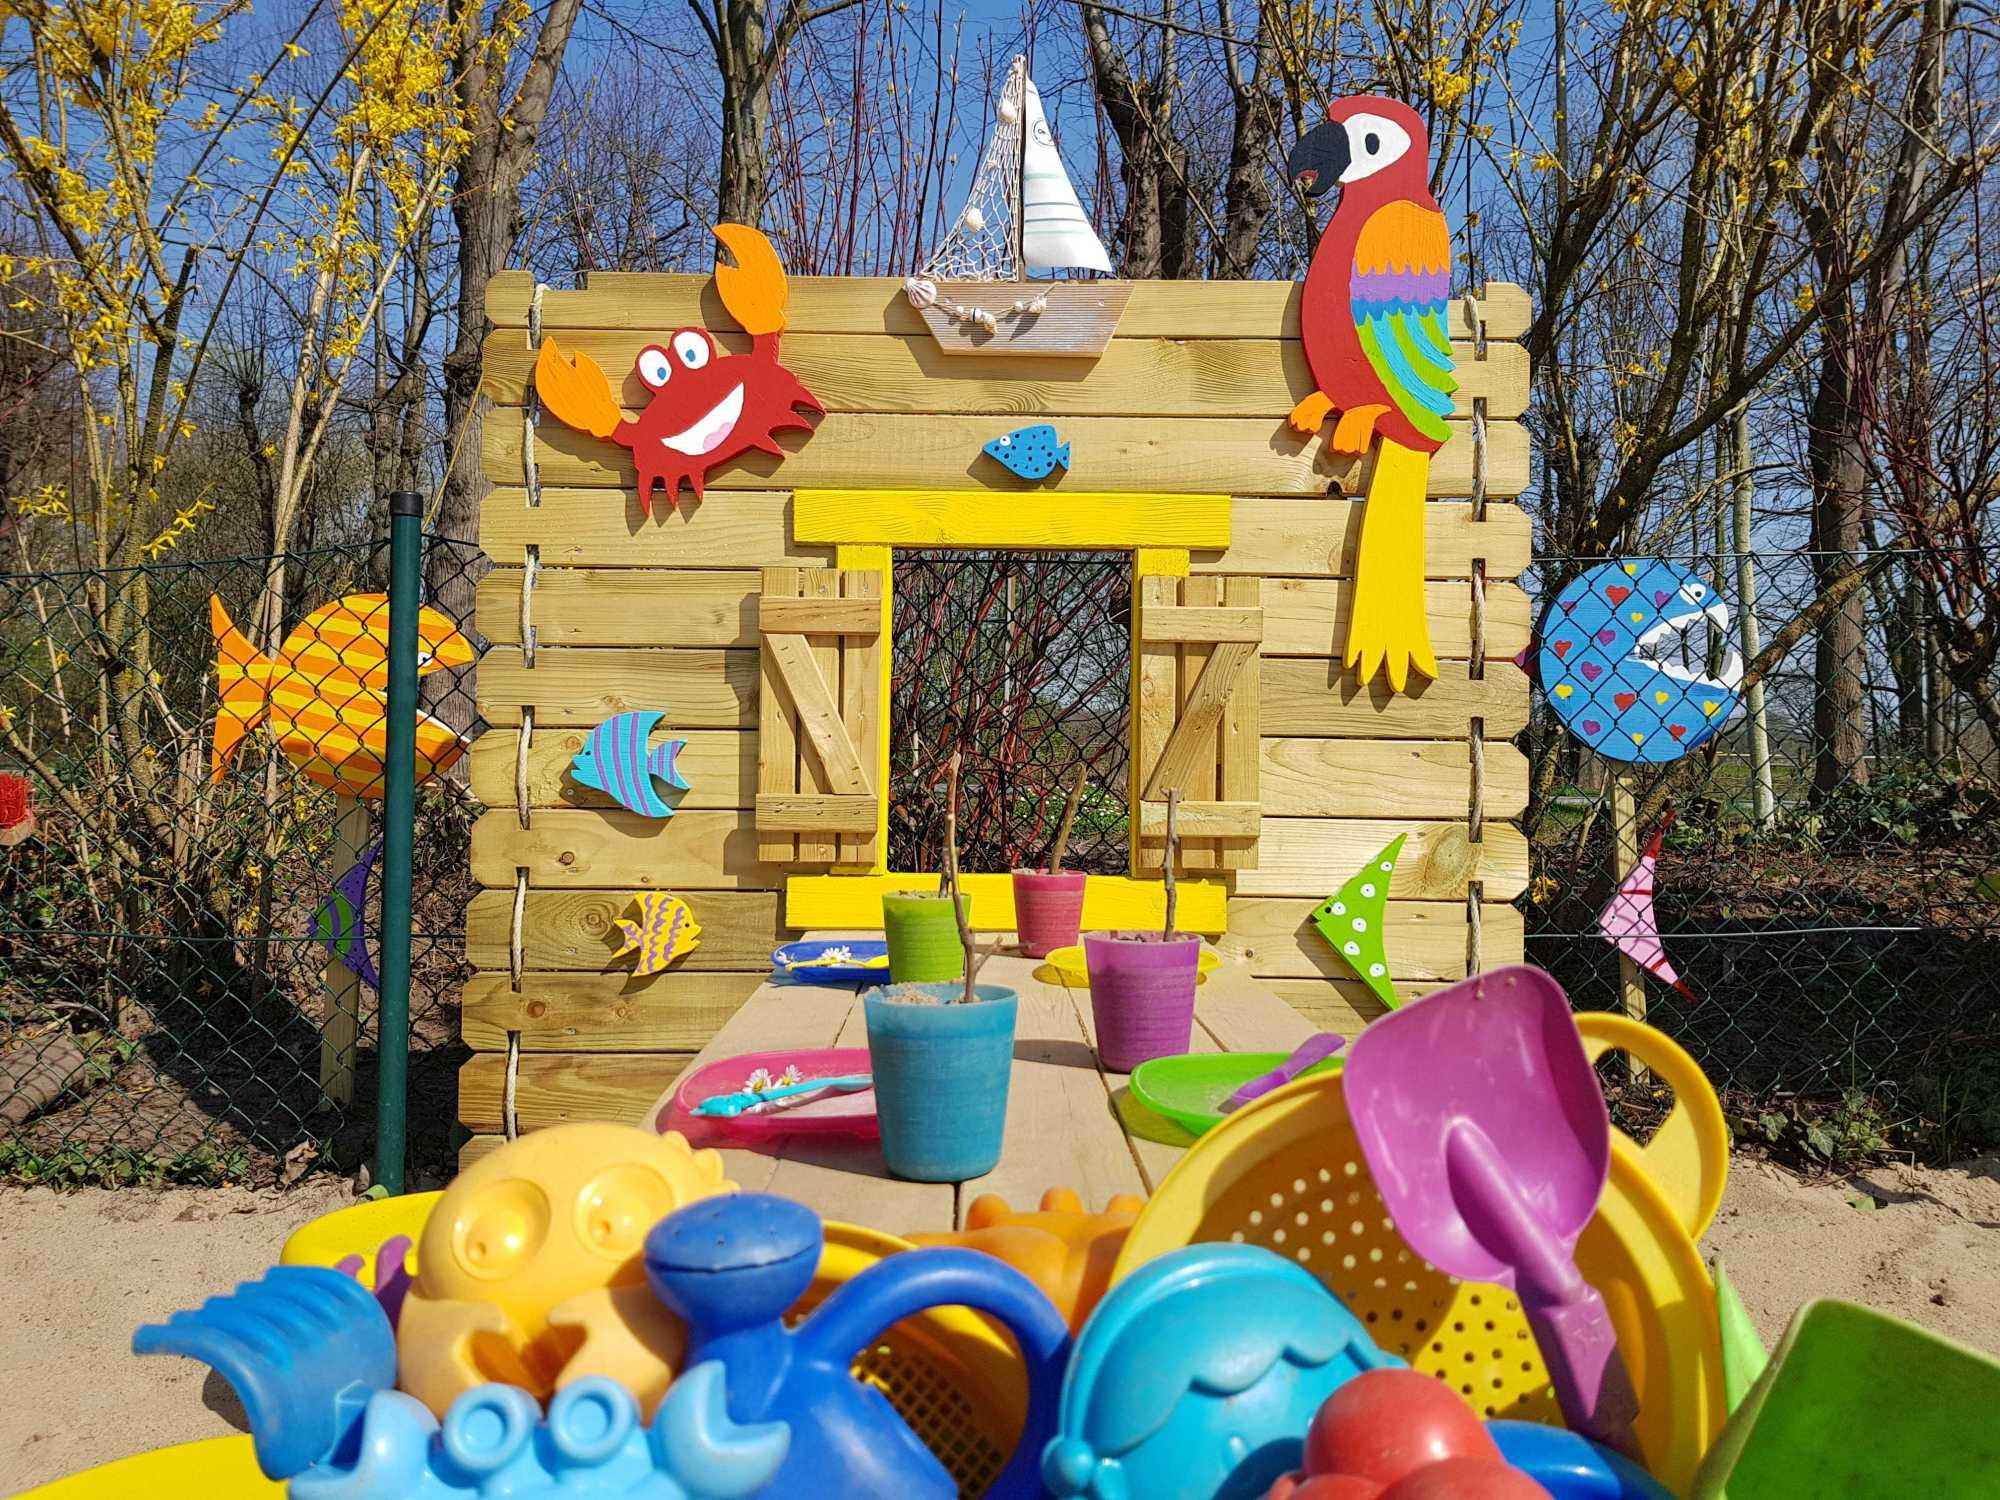 Kita Kid Zone Kinderbetreuung Garten1 13 - Kinder-Beachclub